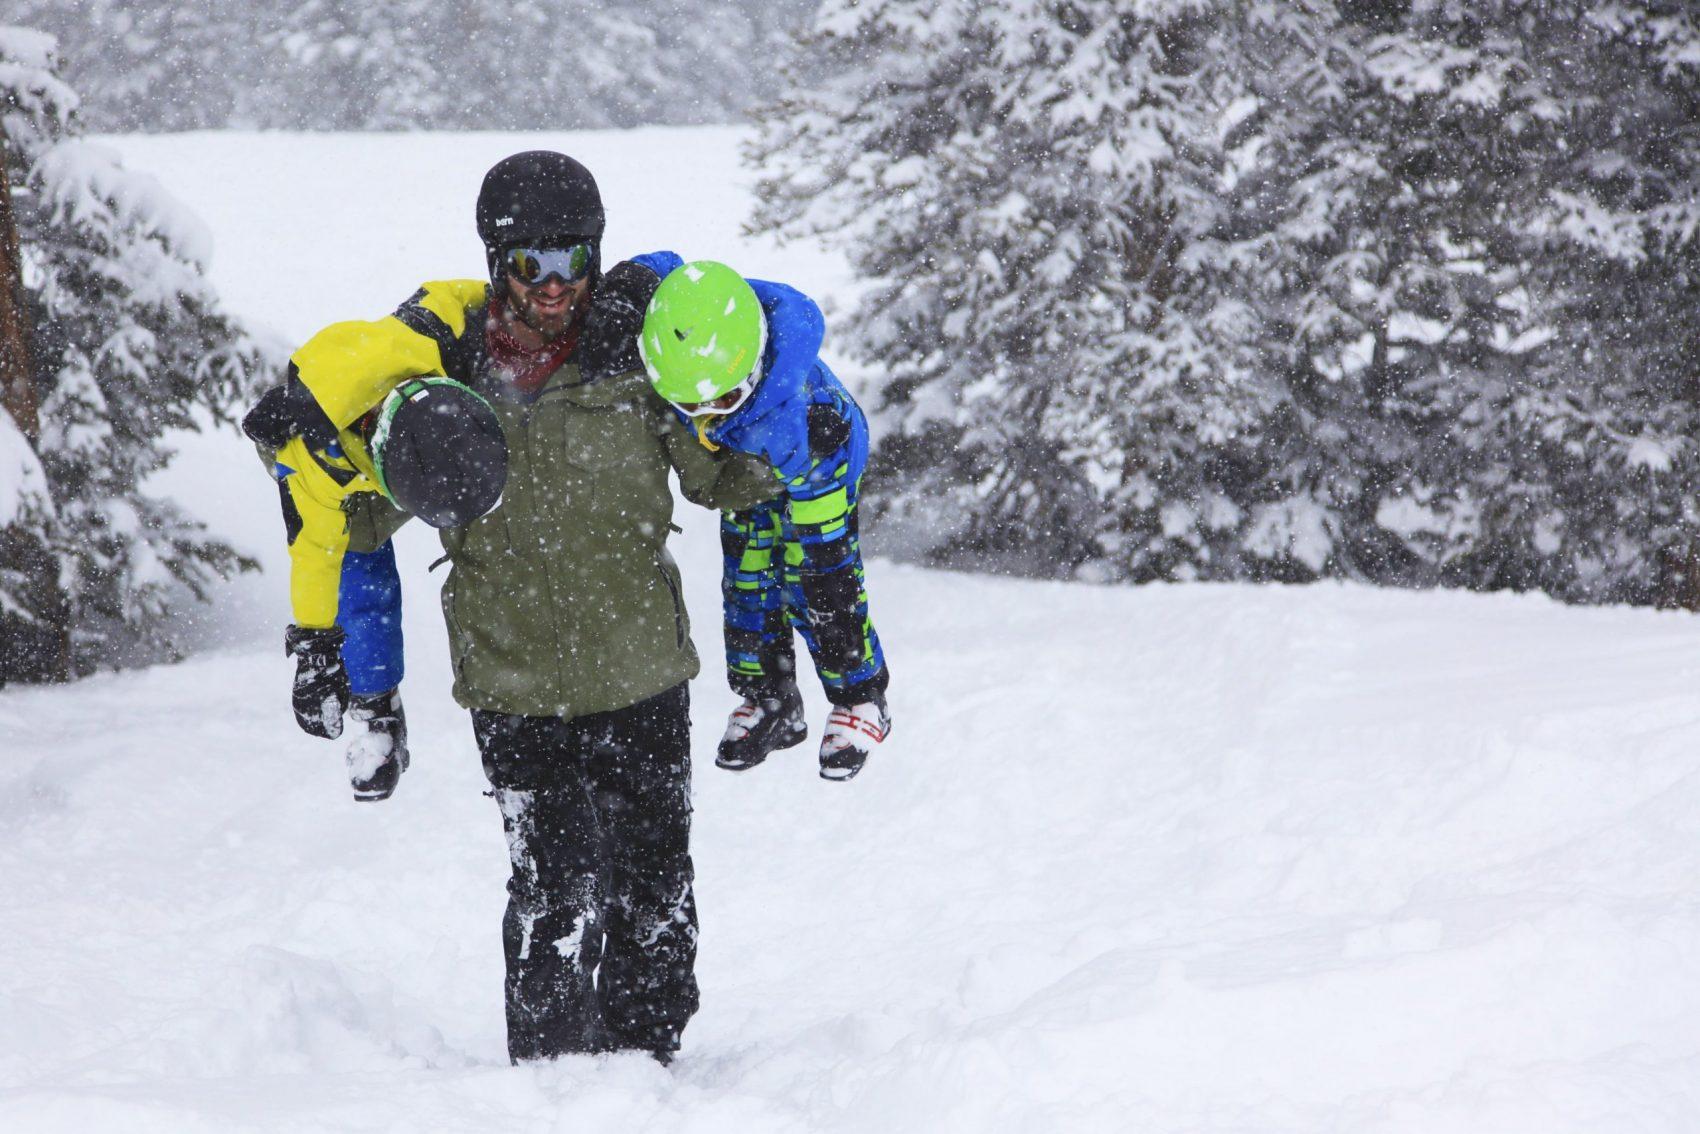 ski instructor carrying kids